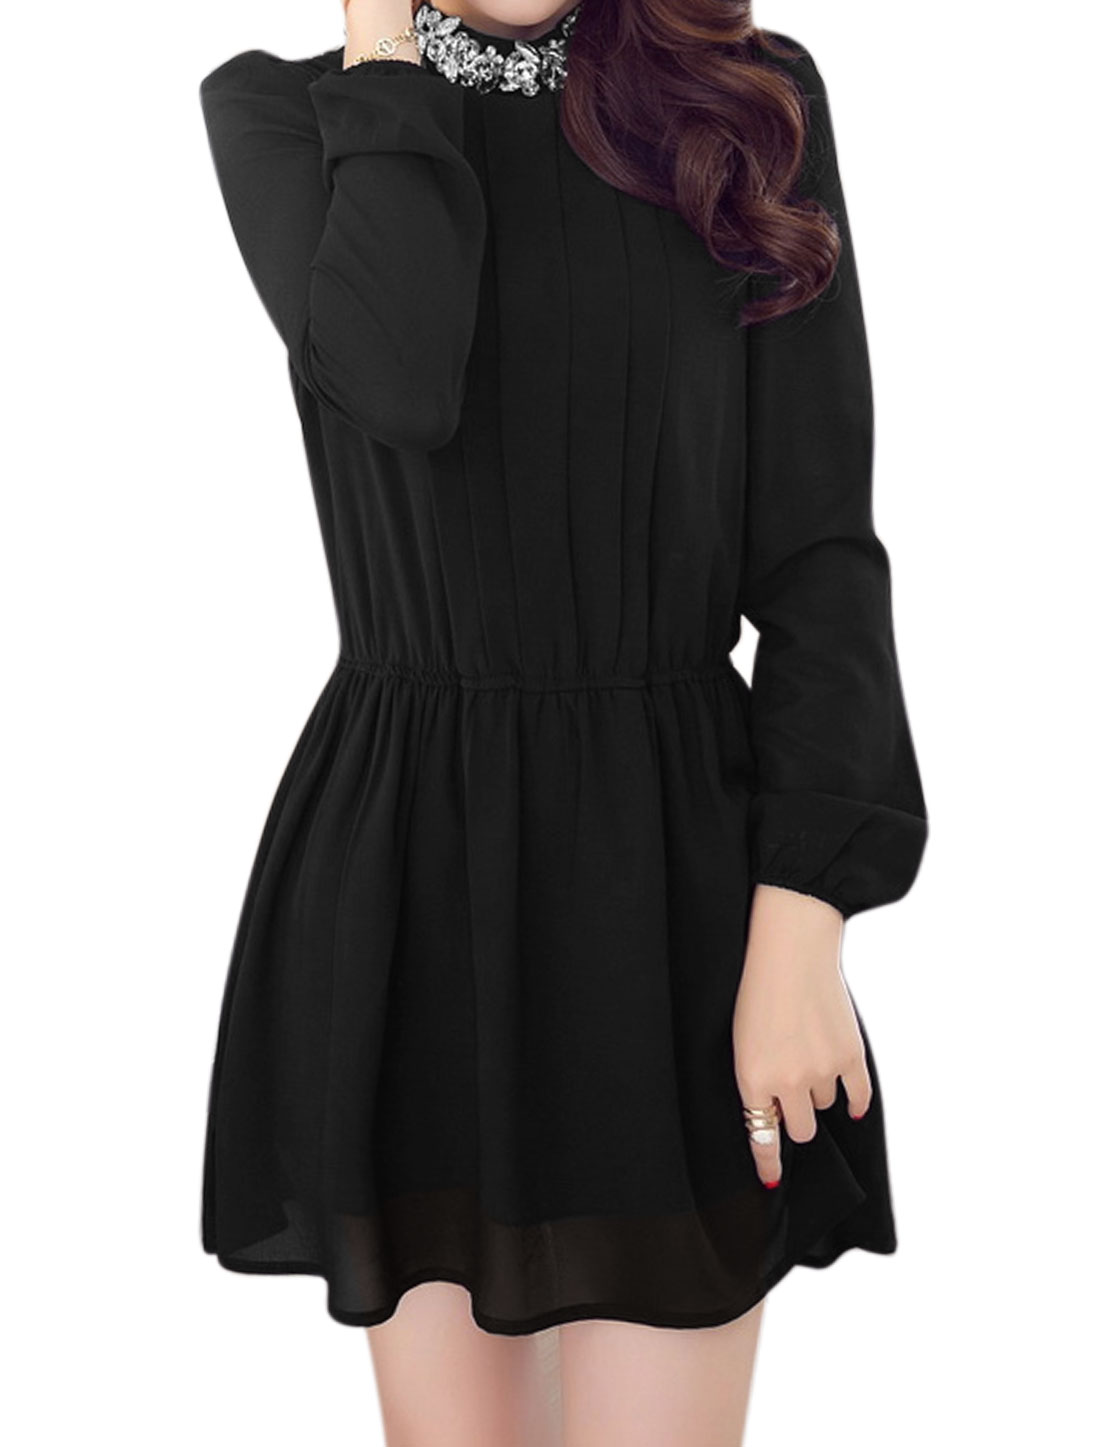 Women Stand Collar Rhinestones Decor Elastic Waist Mini Dress Black M